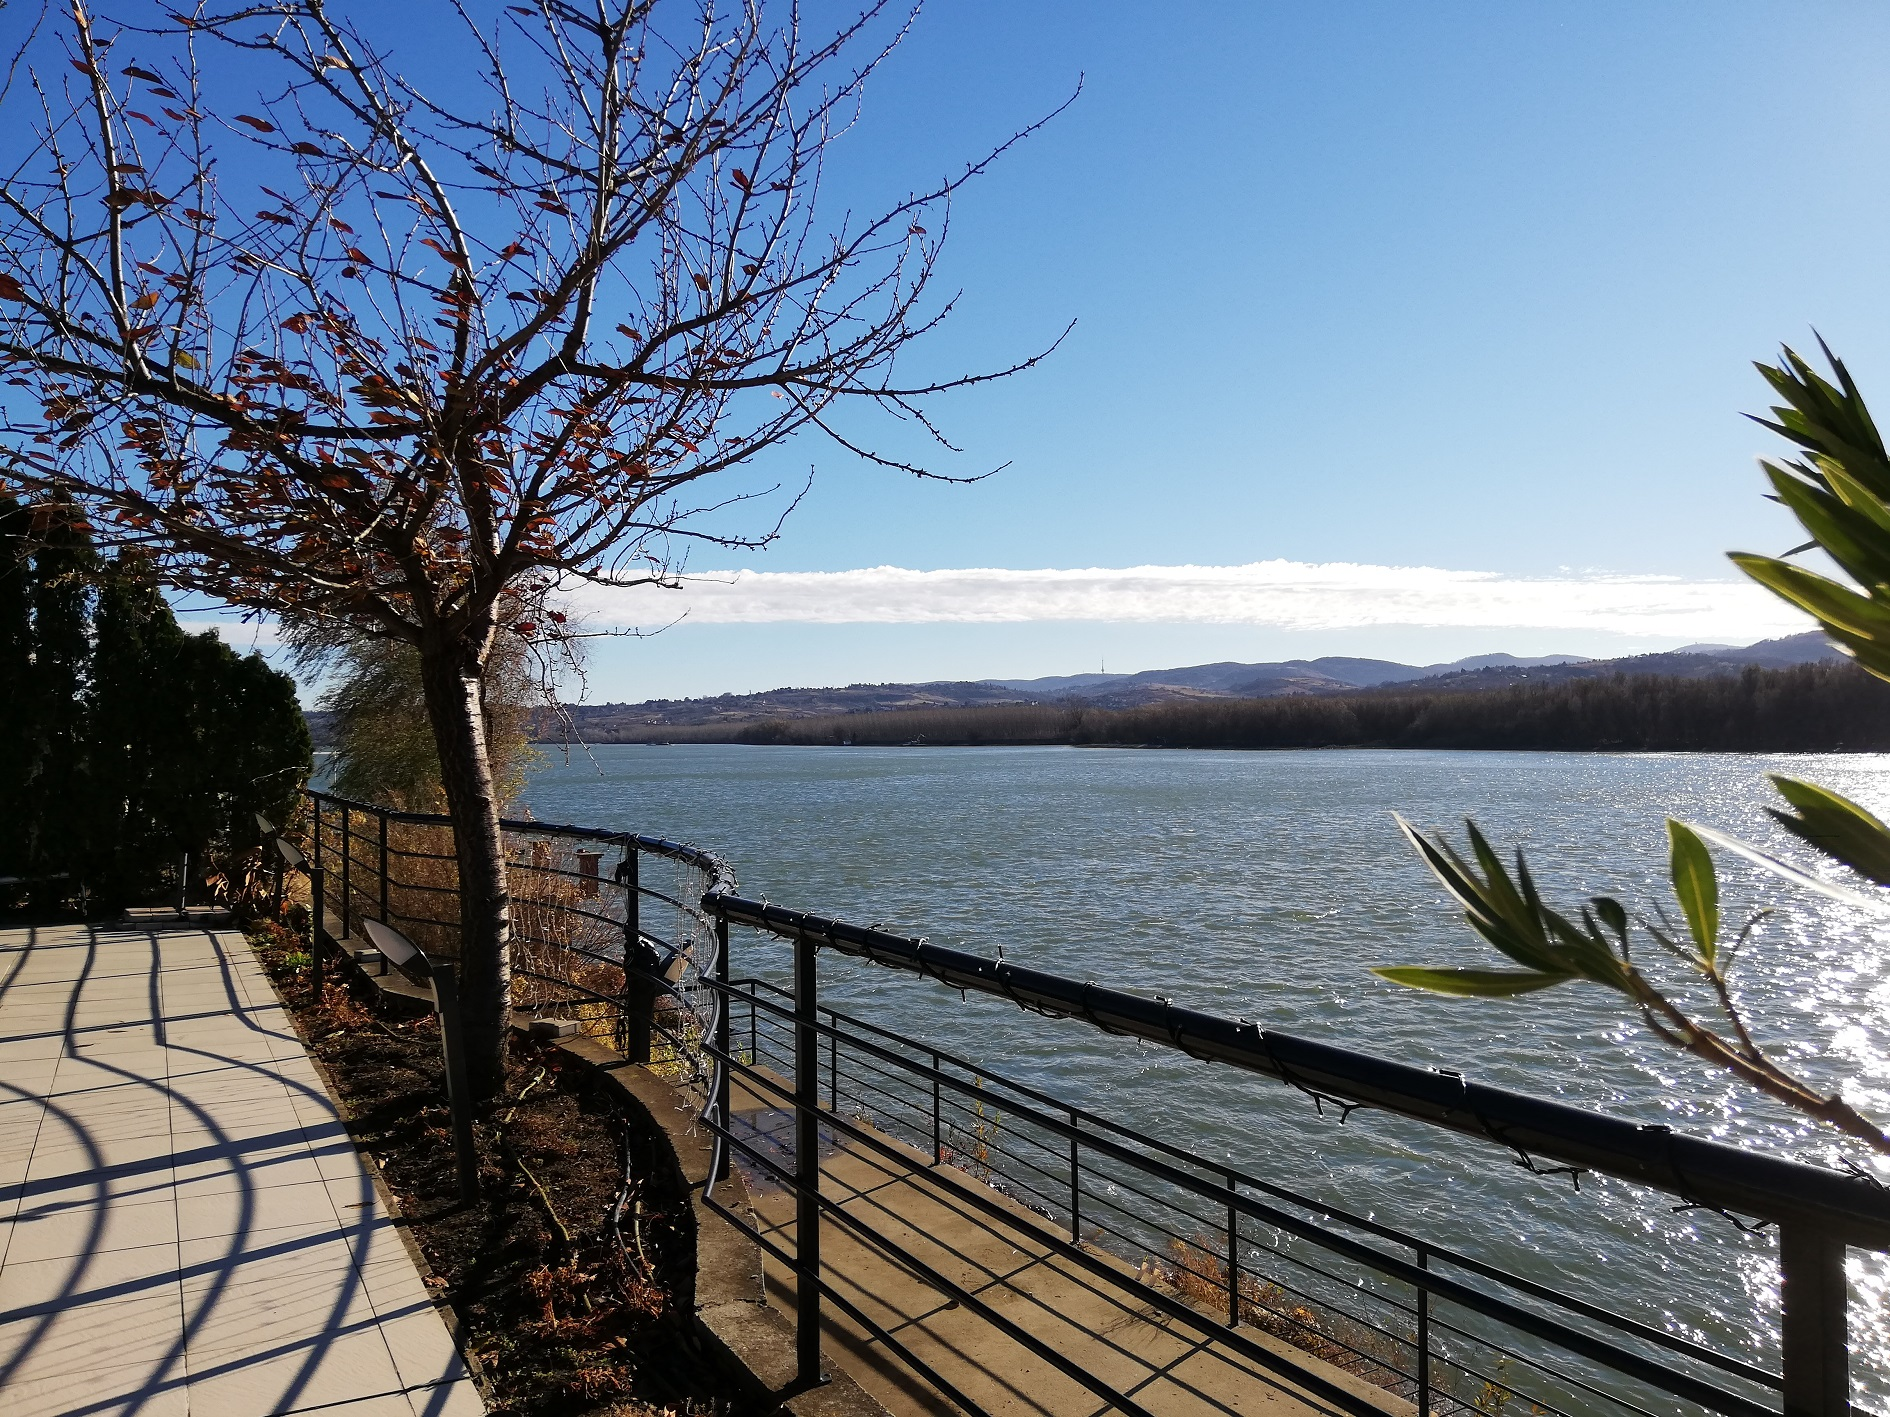 Panorama Aqualux Novi Sad Ujvidek Danube Duna